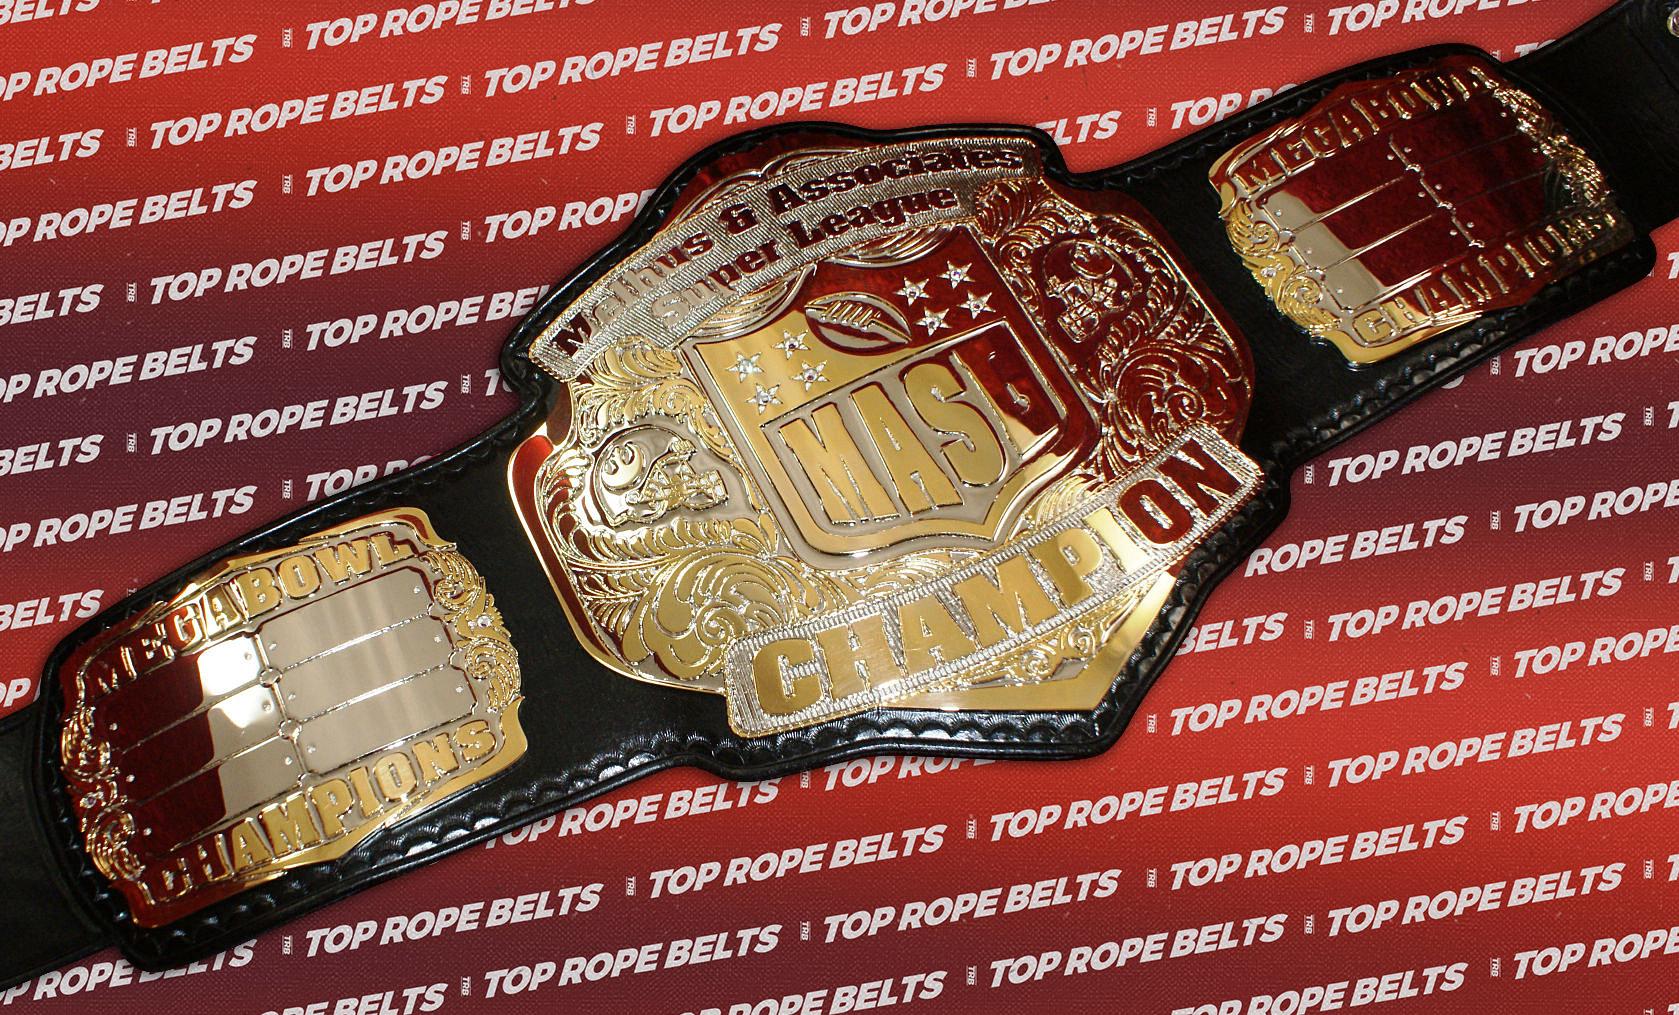 Melhus Super League Fantasy Football Title  Top Rope Belts